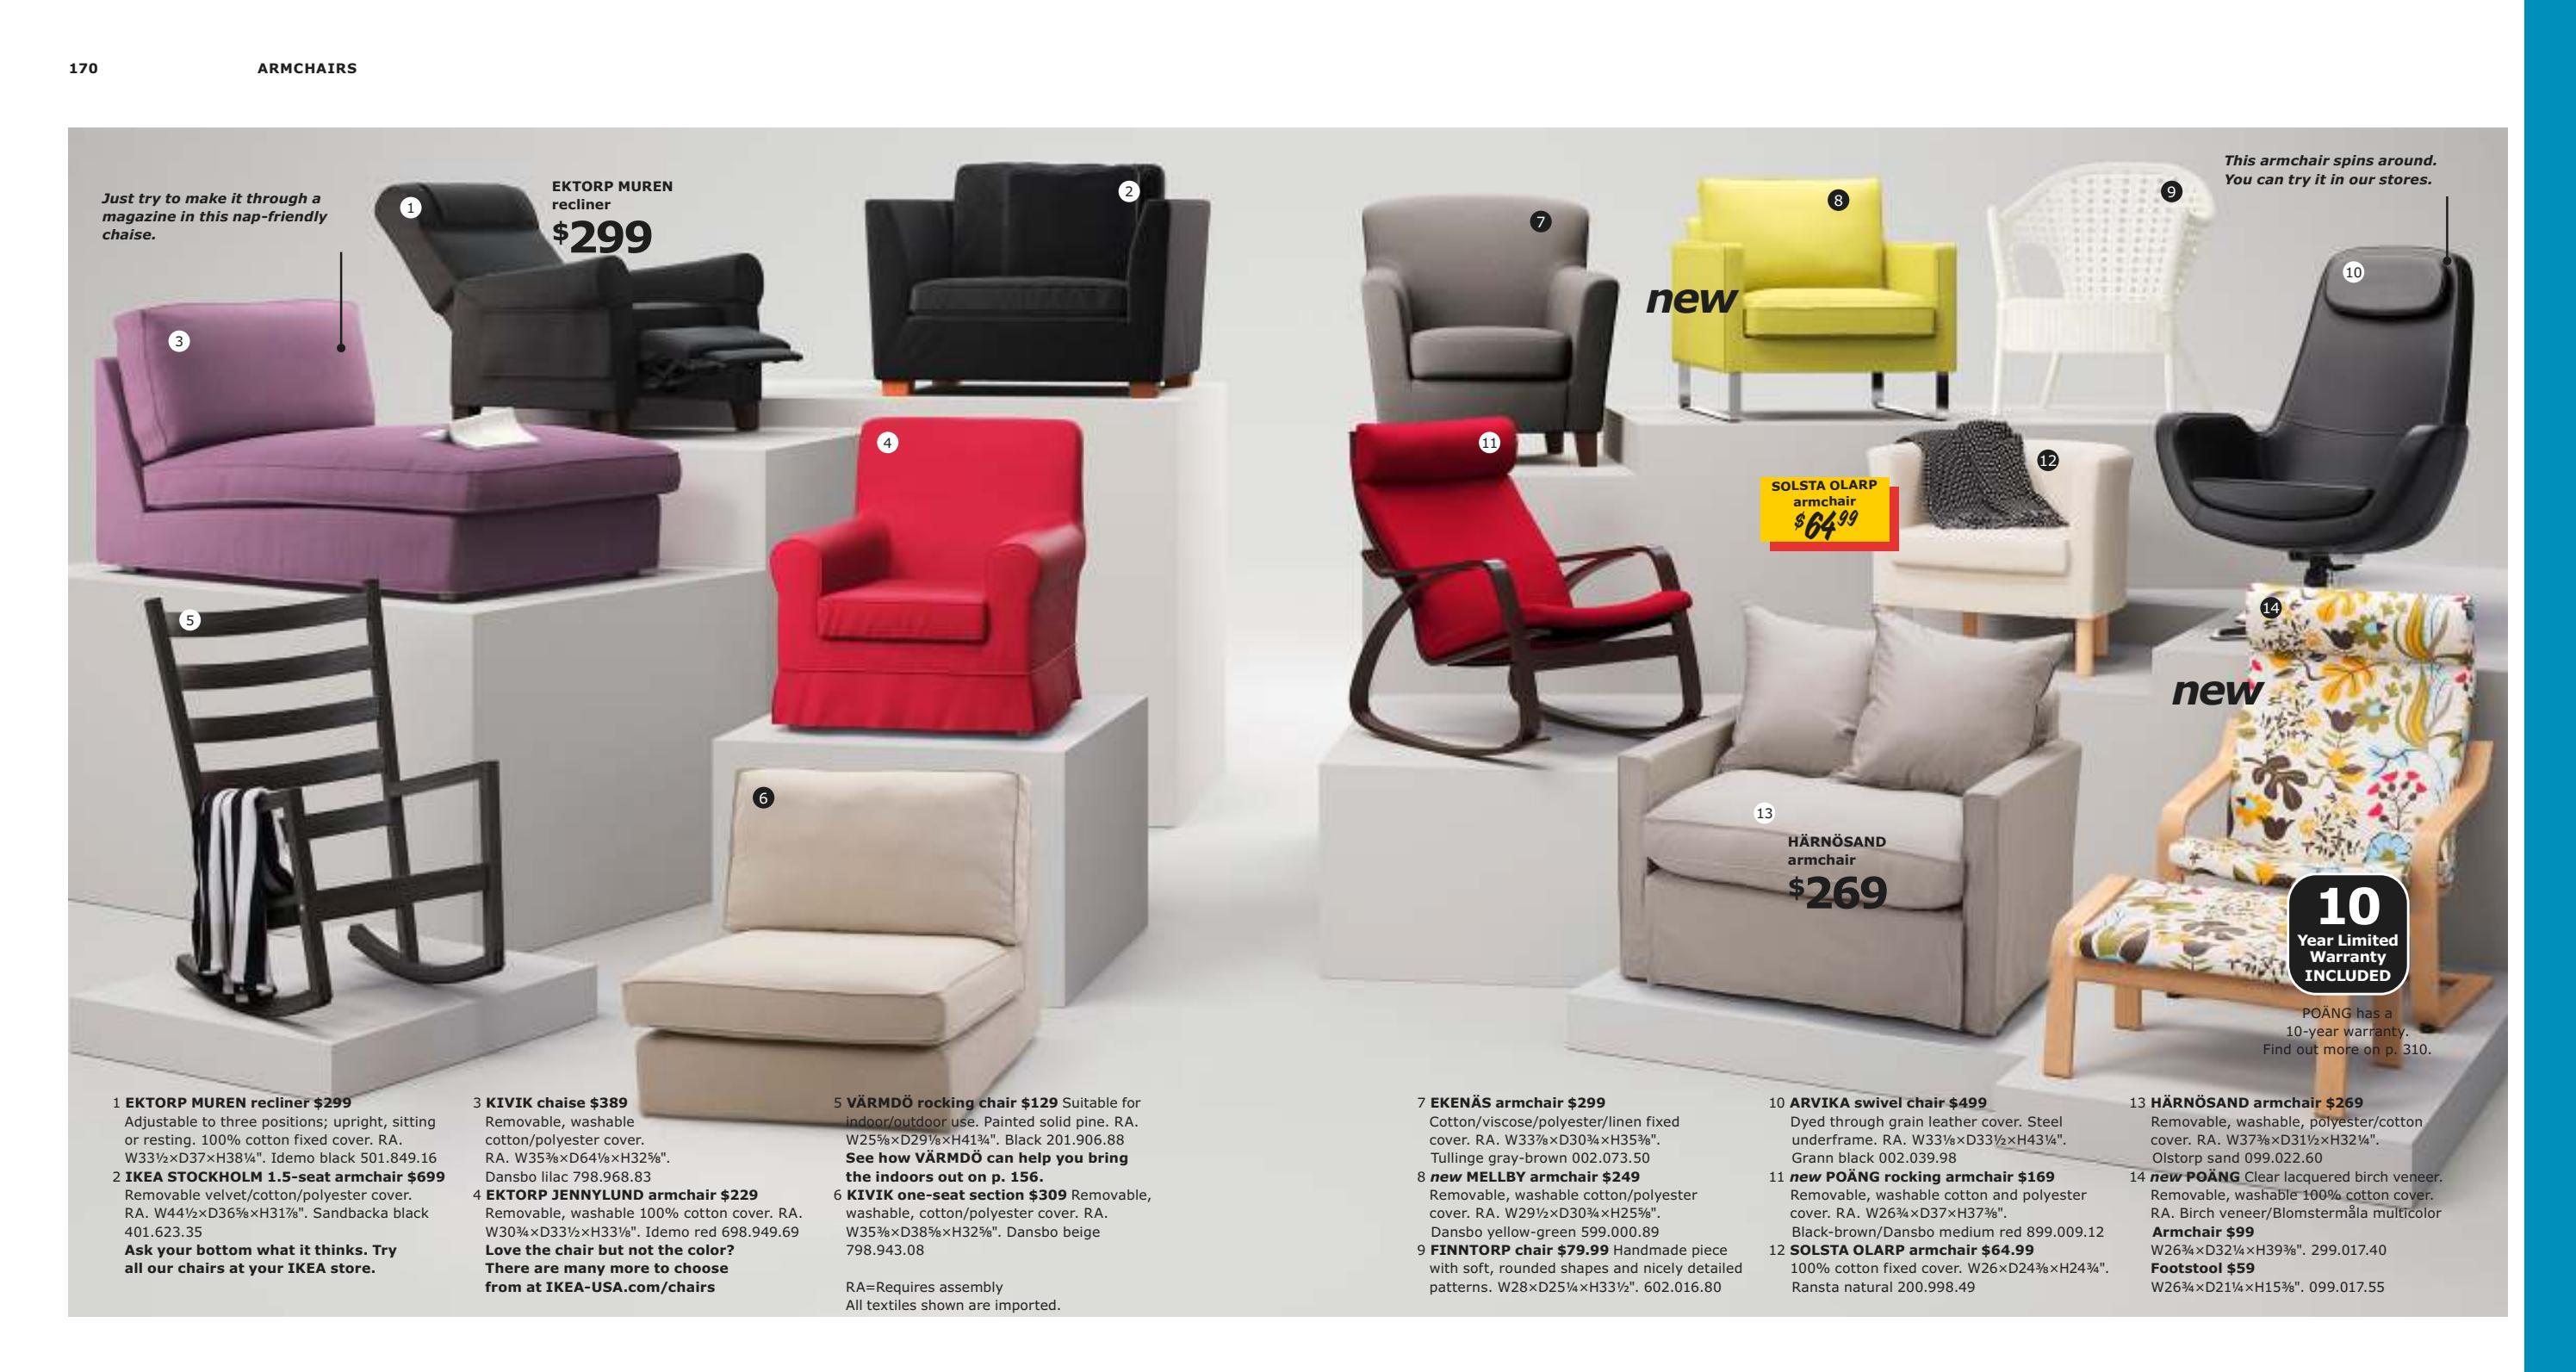 Peachy Ikea Catalog 2013 Us By Eilier Decor Issuu Bralicious Painted Fabric Chair Ideas Braliciousco